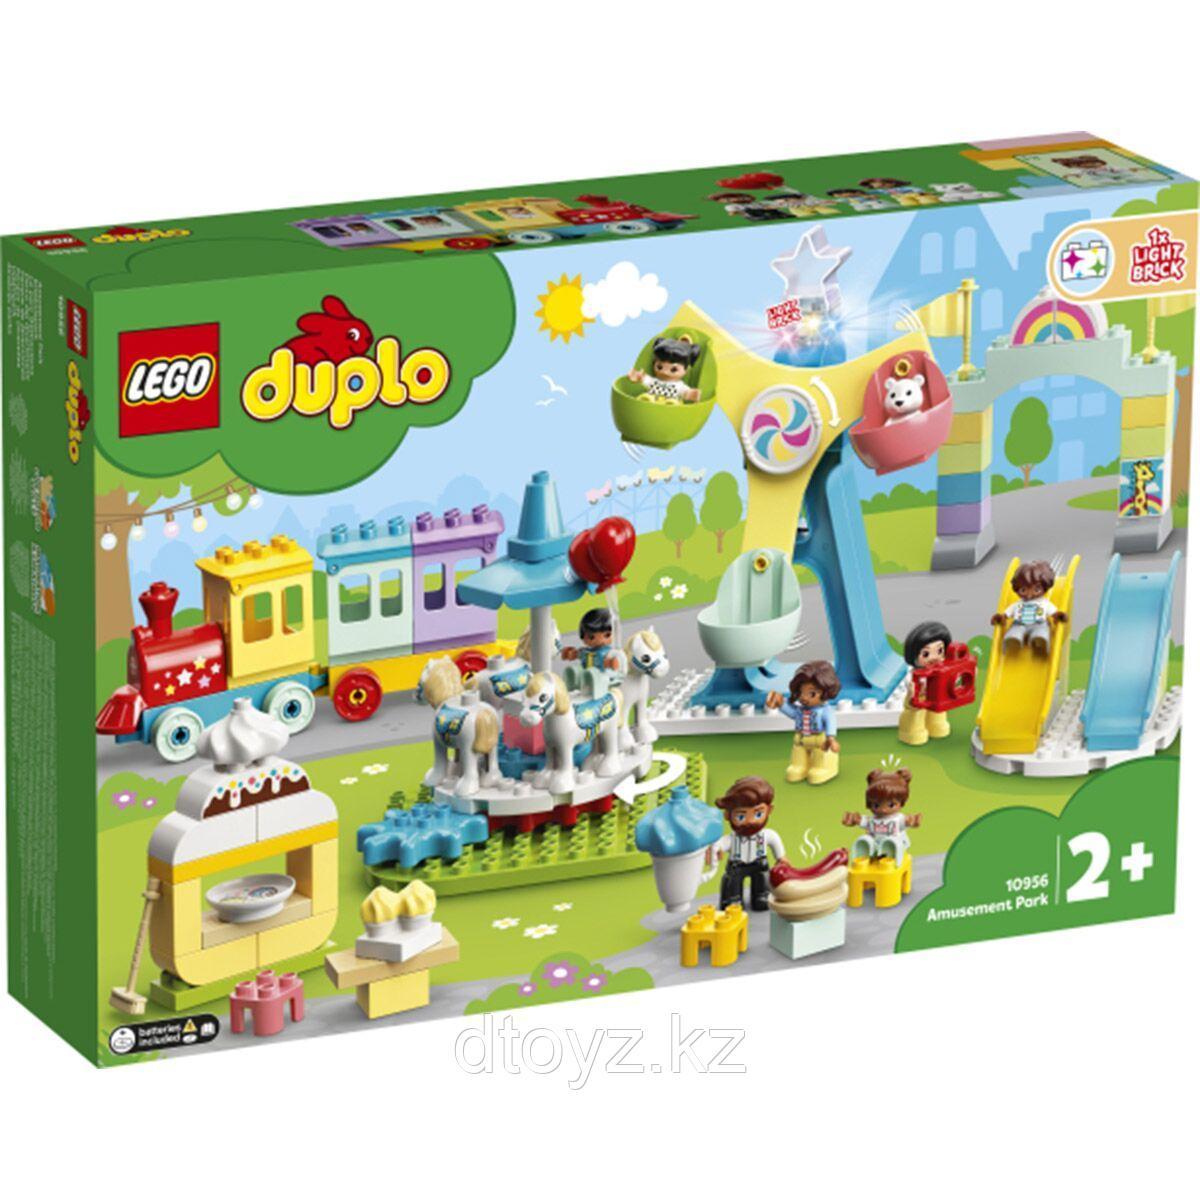 Lego Duplo Town Парк развлечений 10956